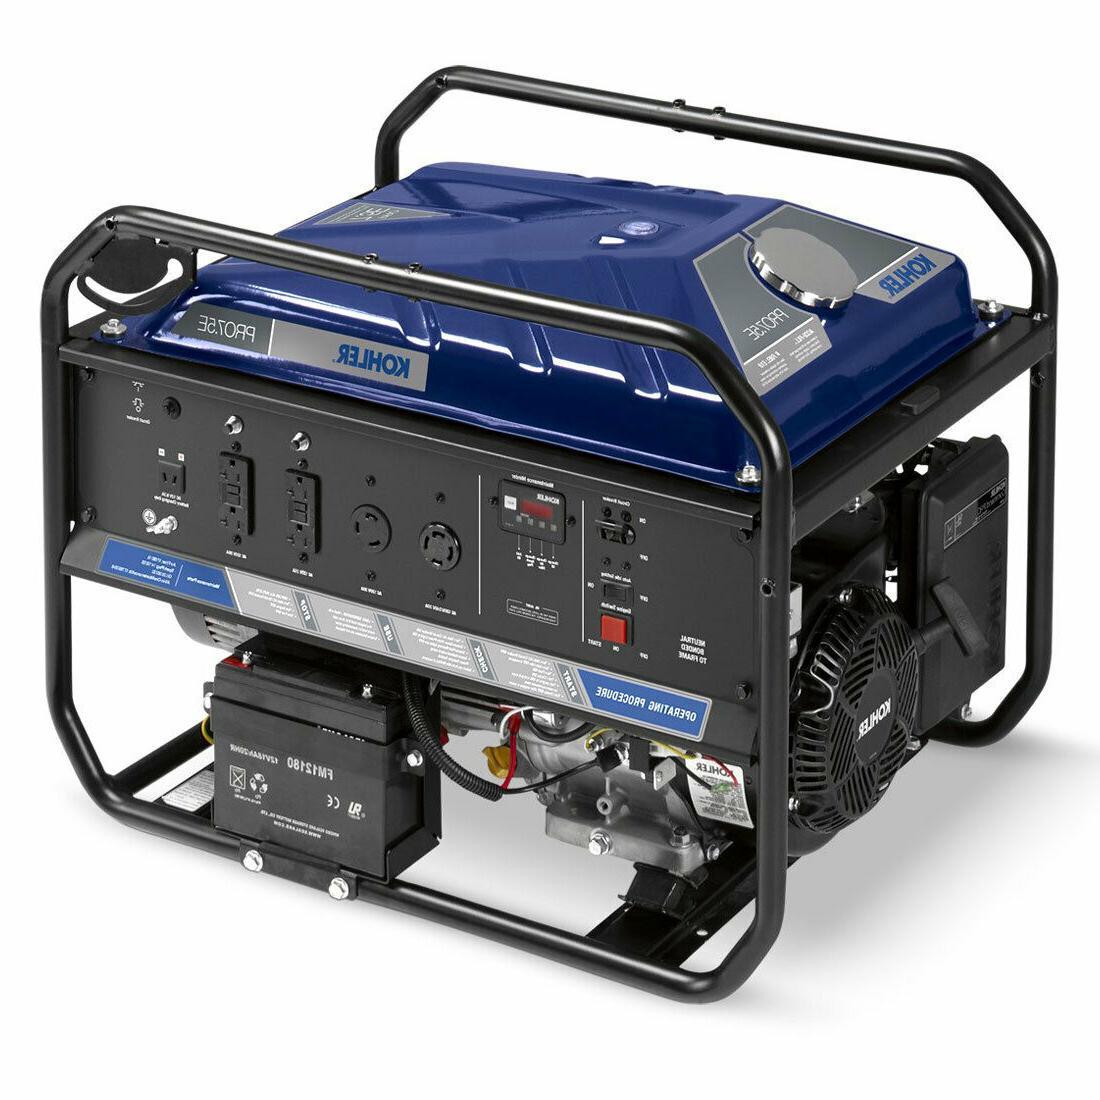 7500w portable generator elec start 3 year